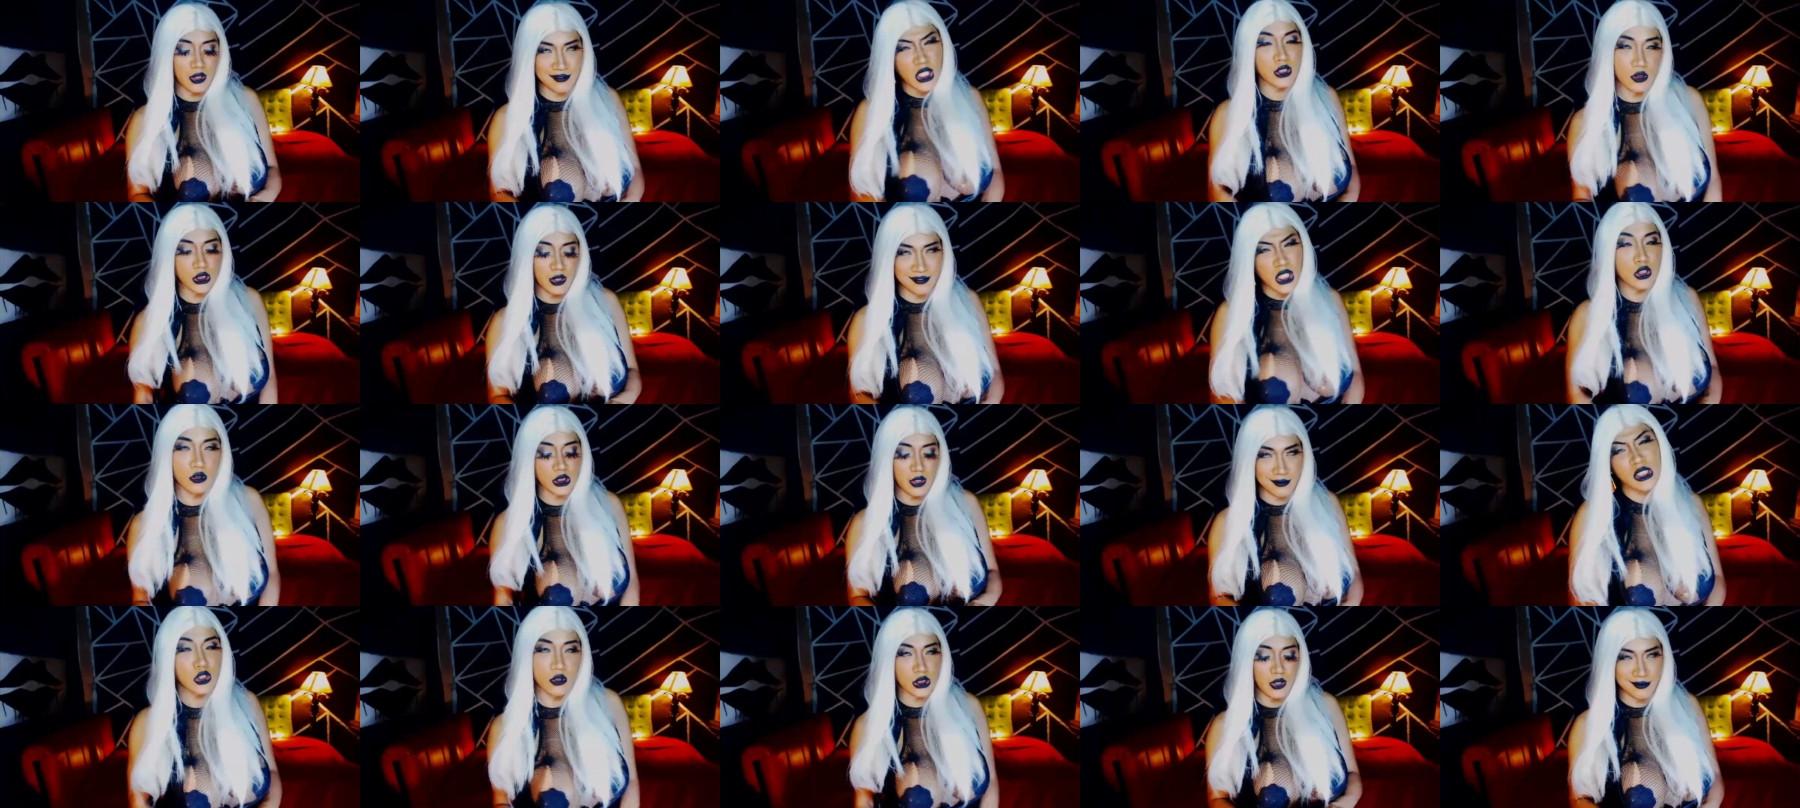 Mistressselfsuckerxxx ts 15-05-2021 Chaturbate trans Webcam